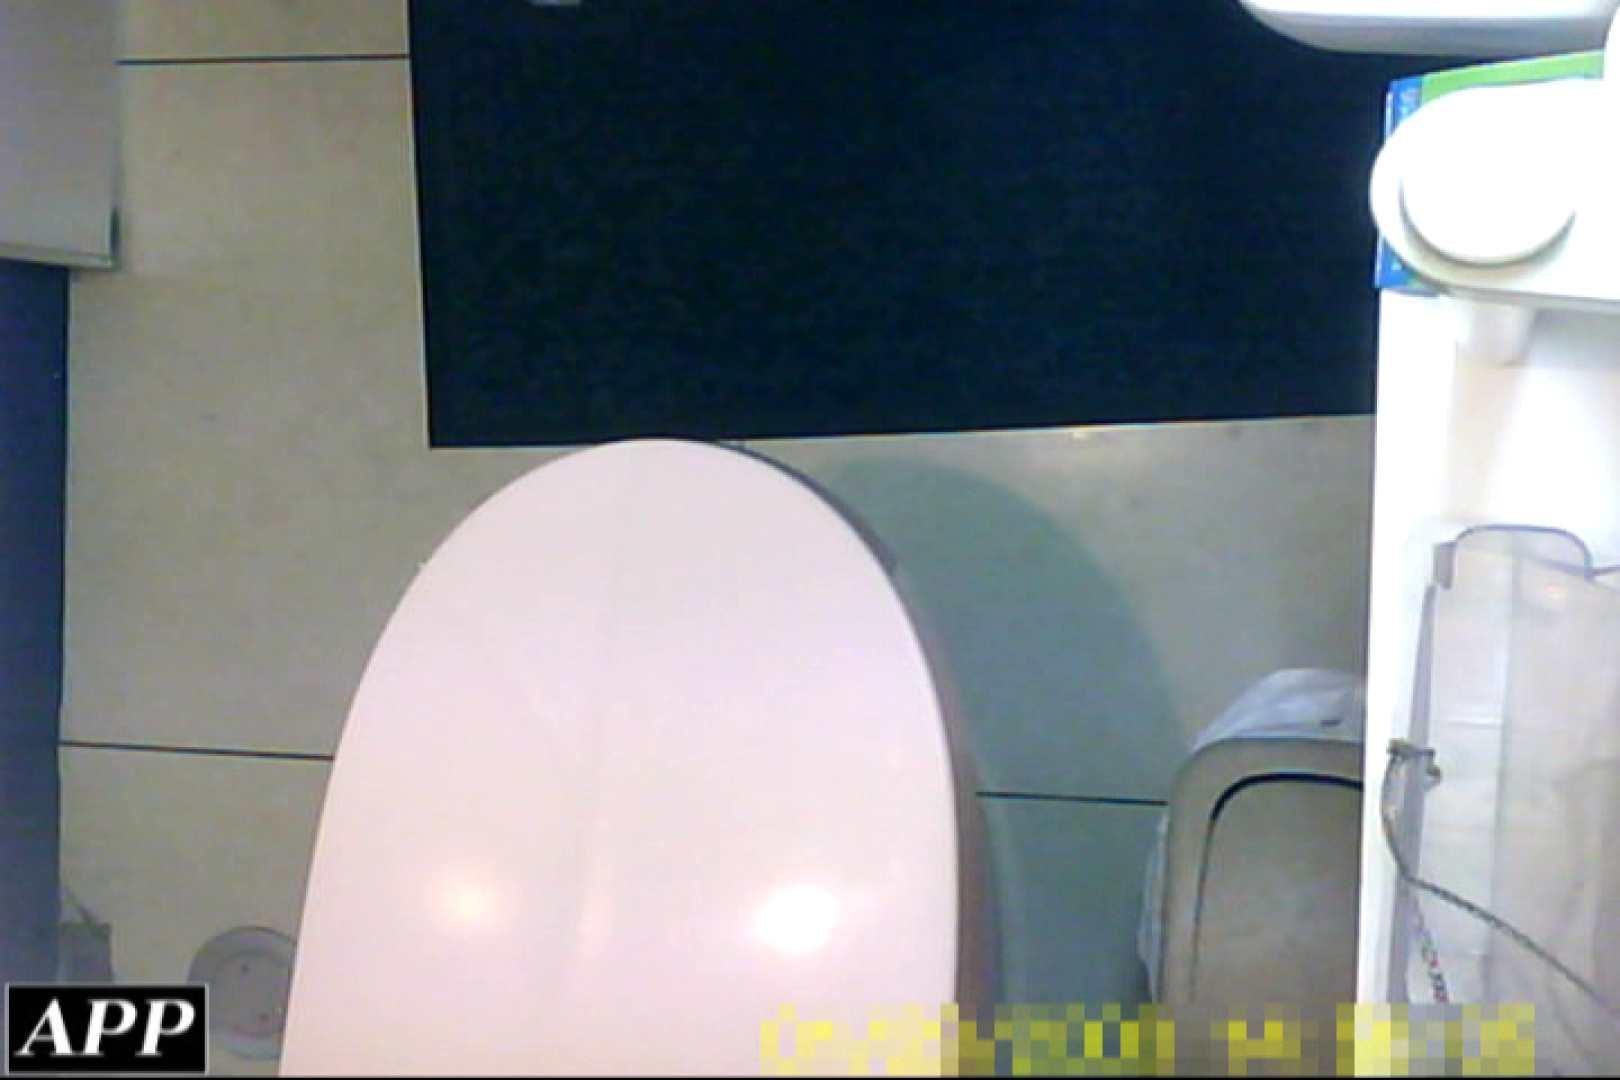 3視点洗面所 vol.48 OLハメ撮り  65Pix 53